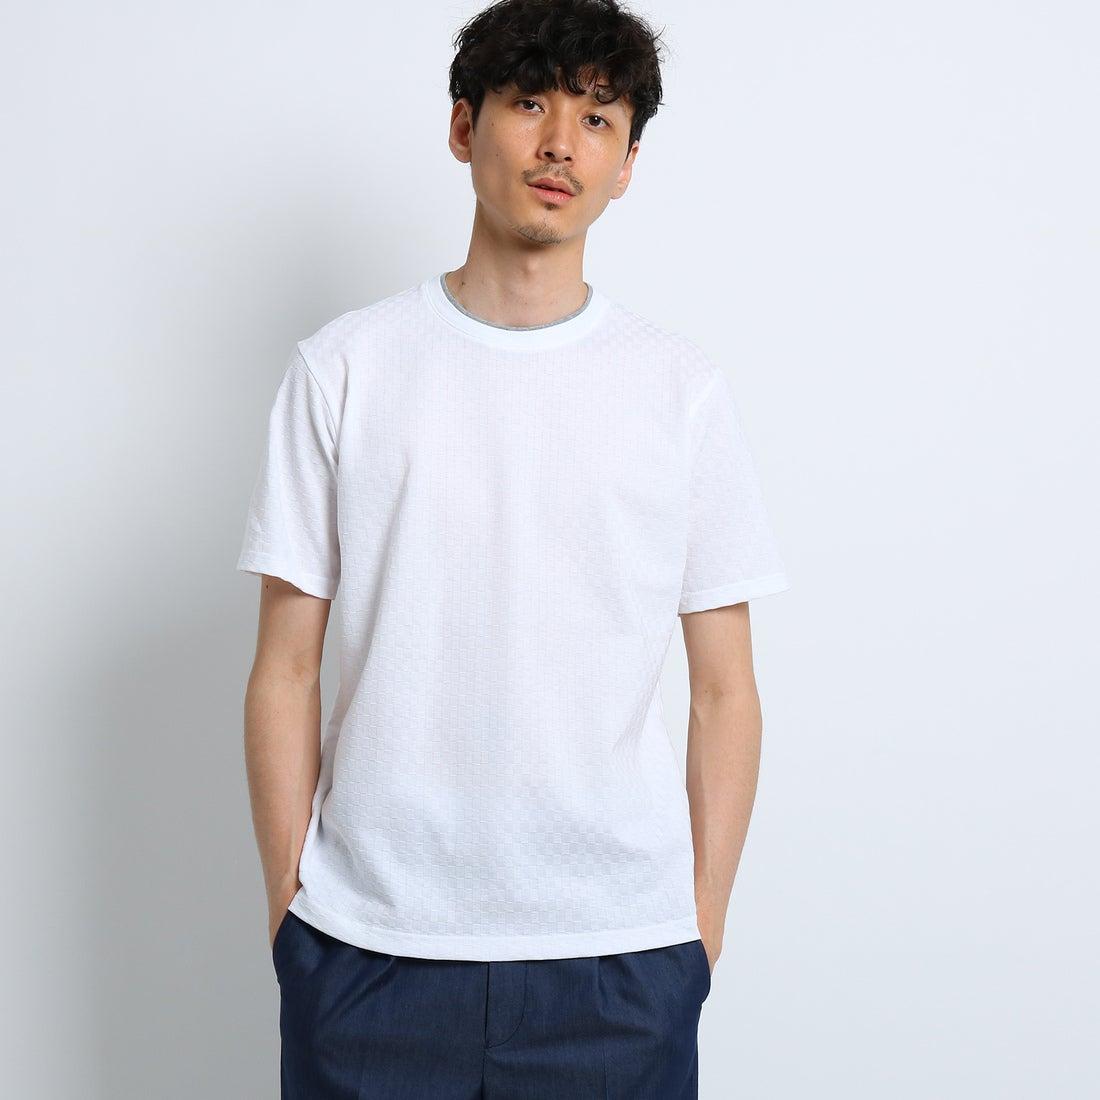 【SALE 50%OFF】タケオ キクチ TAKEO KIKUCHI 市松リンクスプルオーバー[ メンズ カットソー ] (ホワイト)